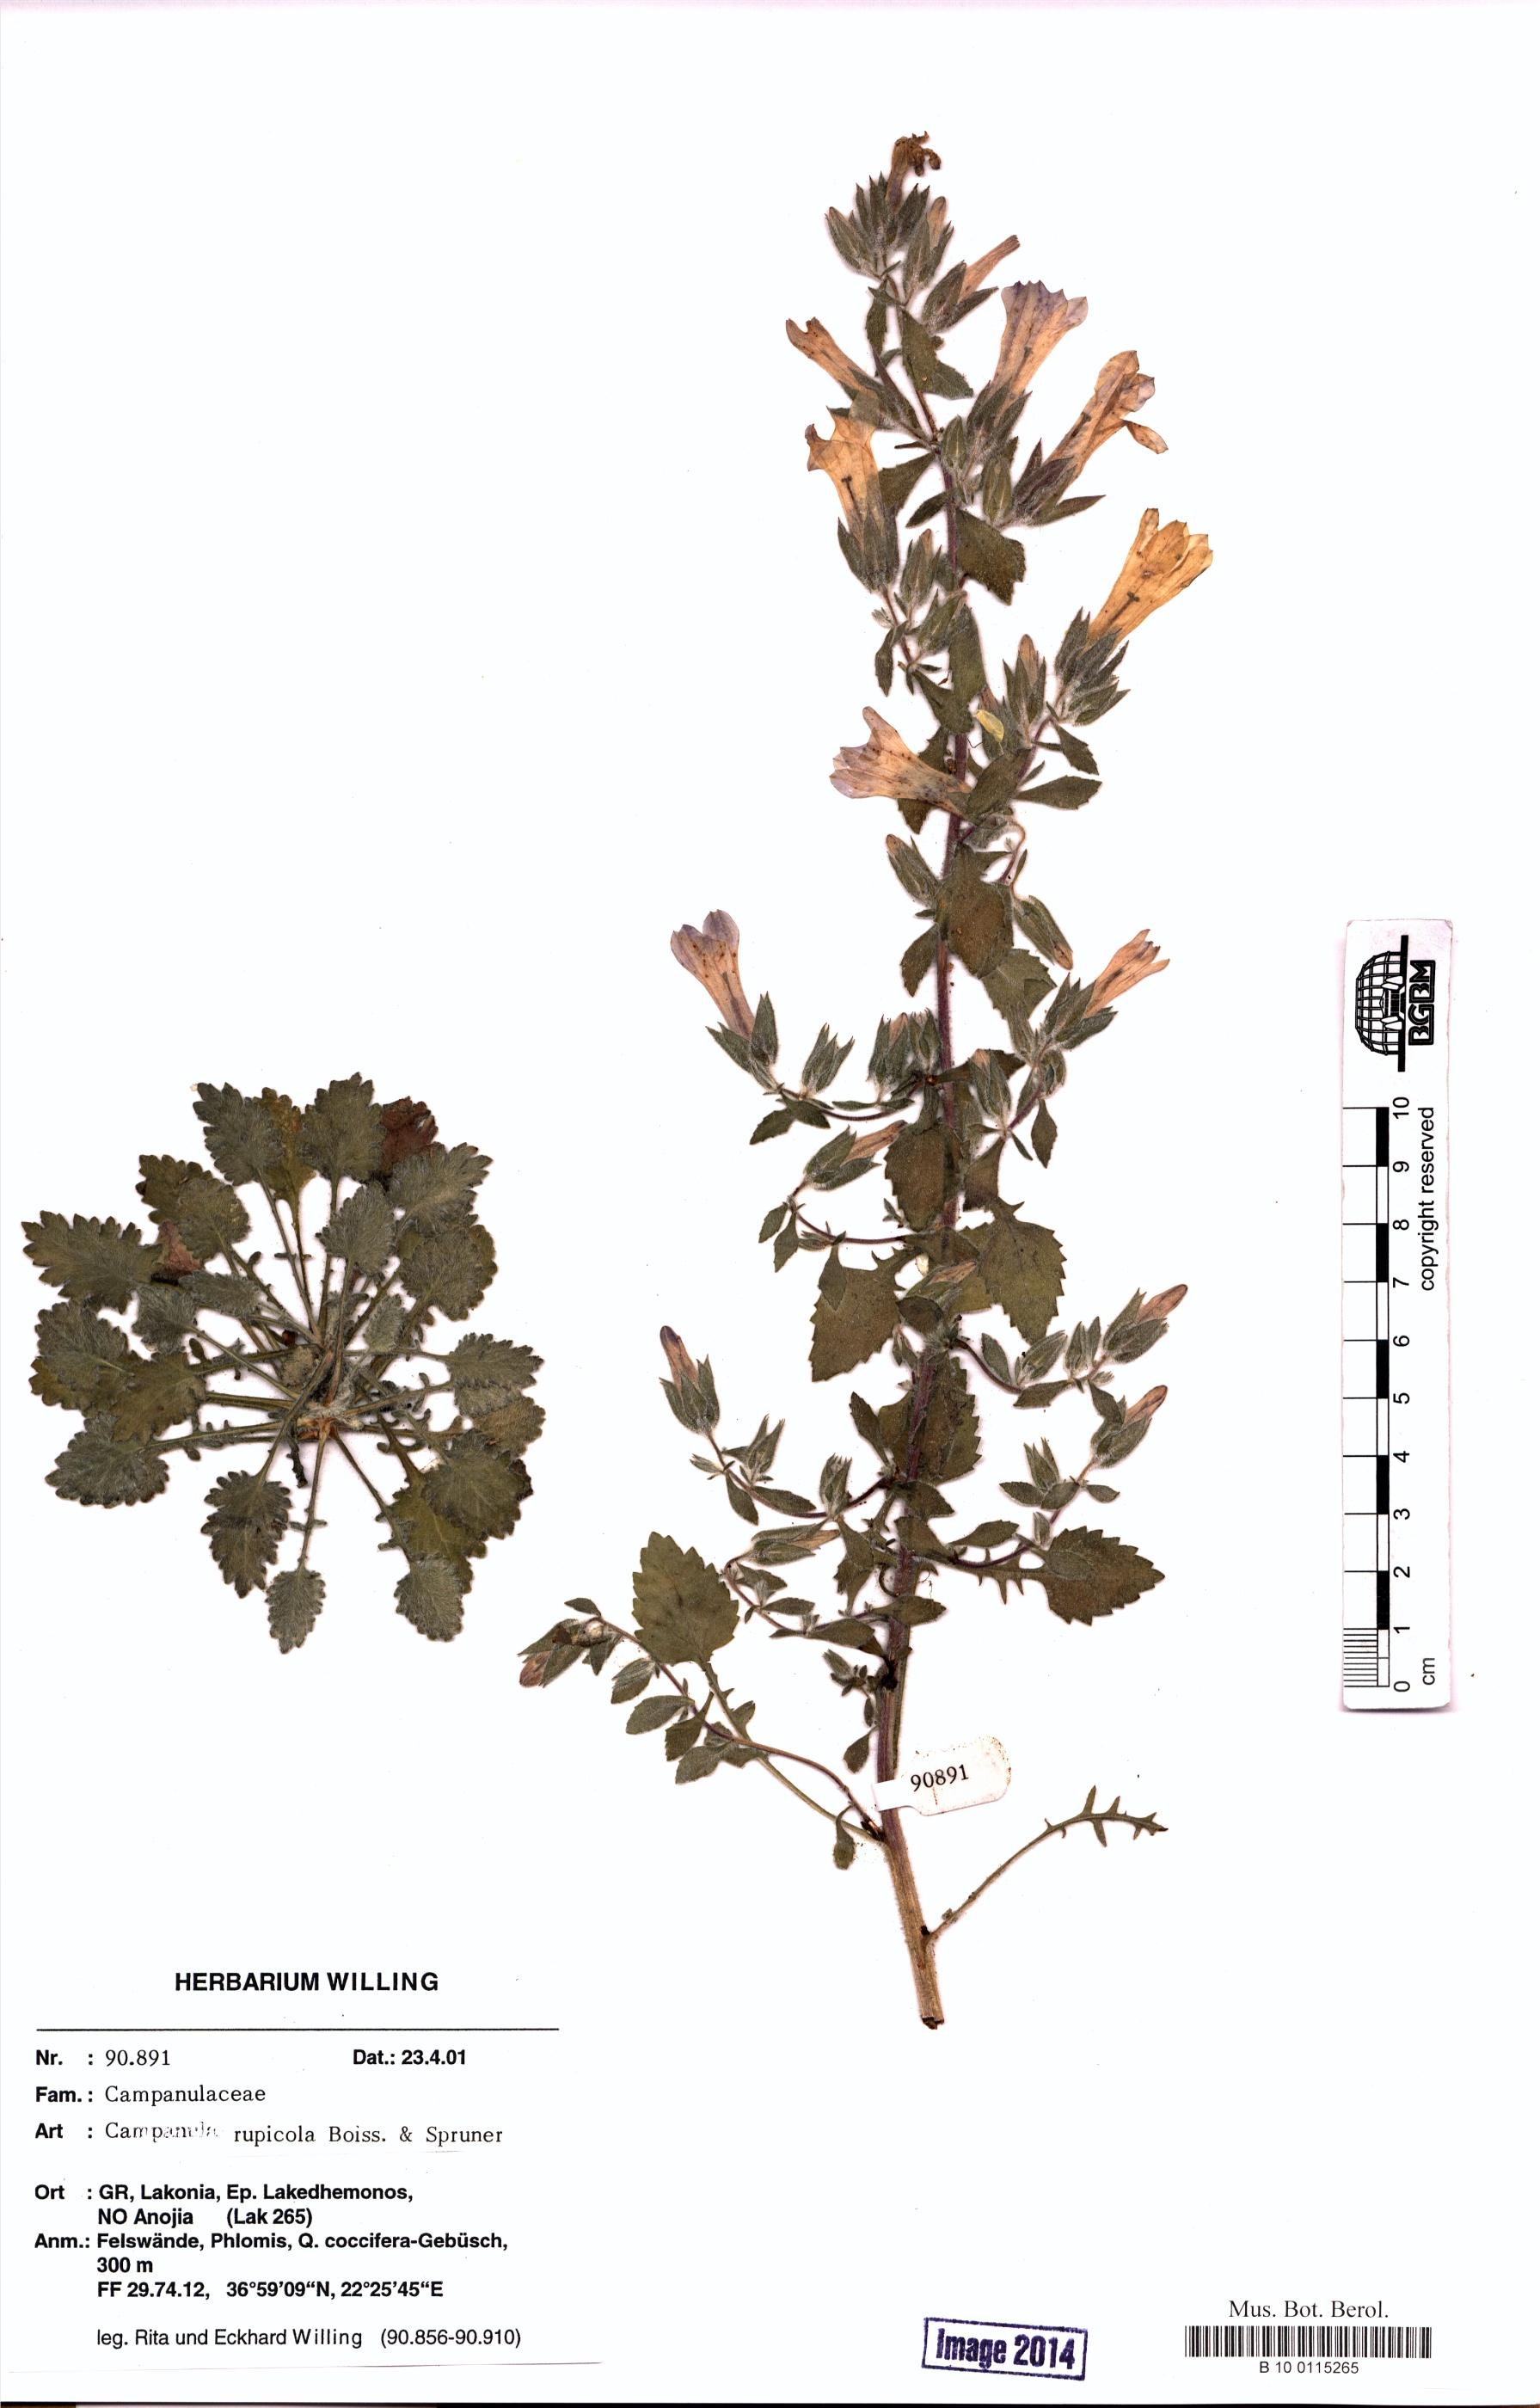 http://ww2.bgbm.org/herbarium/images/B/10/01/15/26/B_10_0115265.jpg